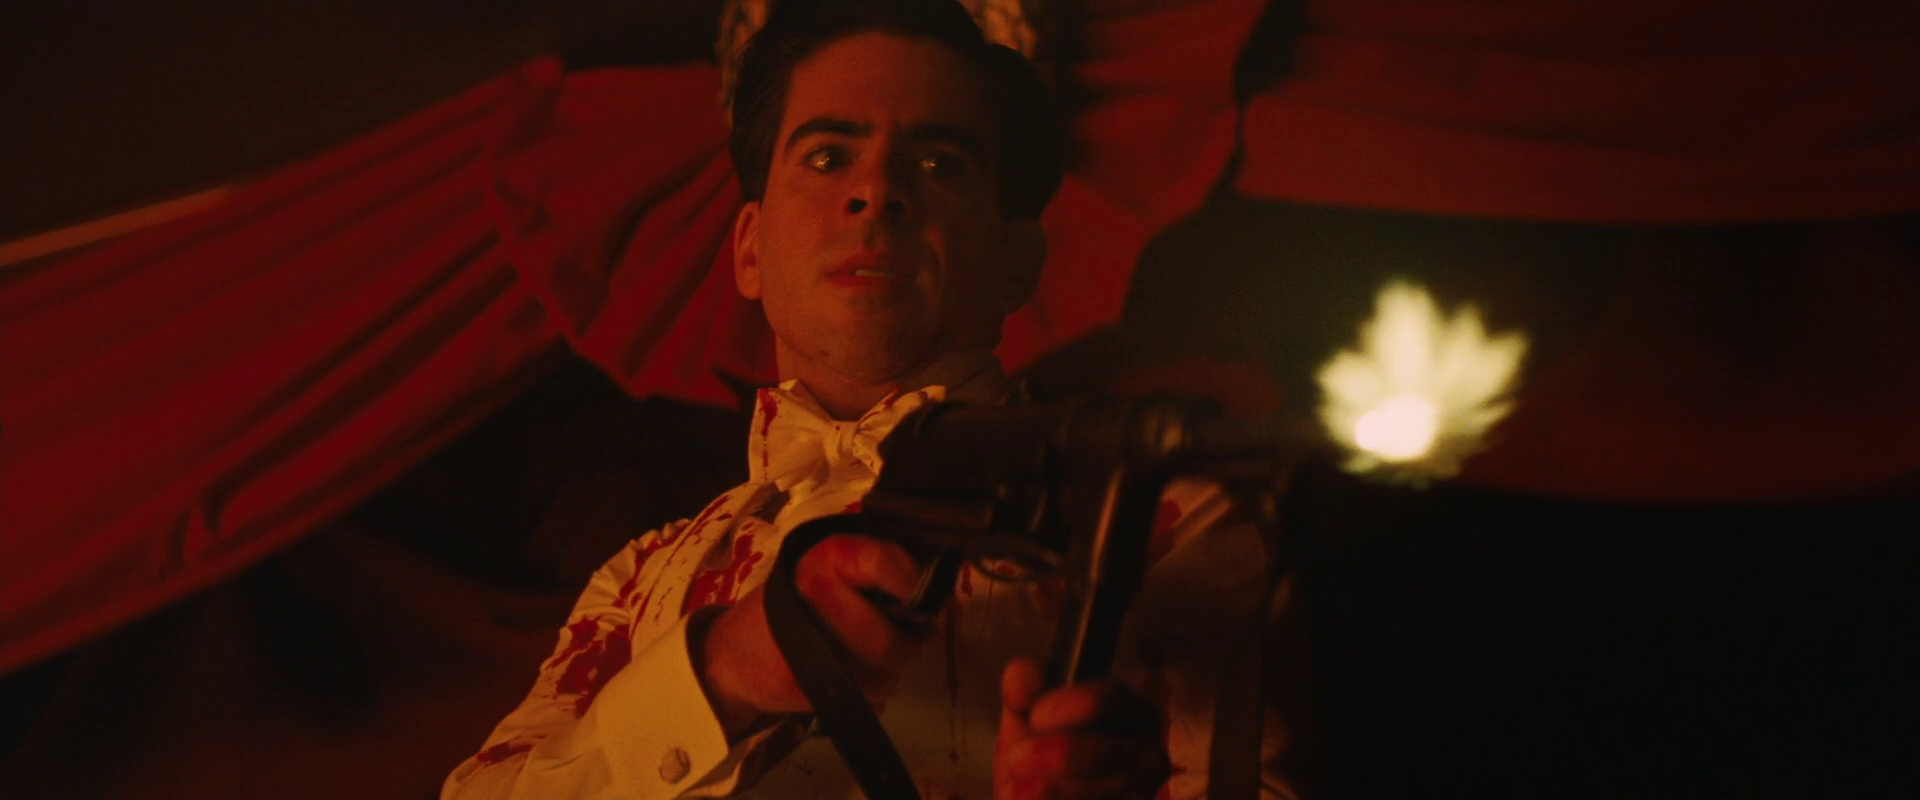 Inglorious basterds Tarantino 11